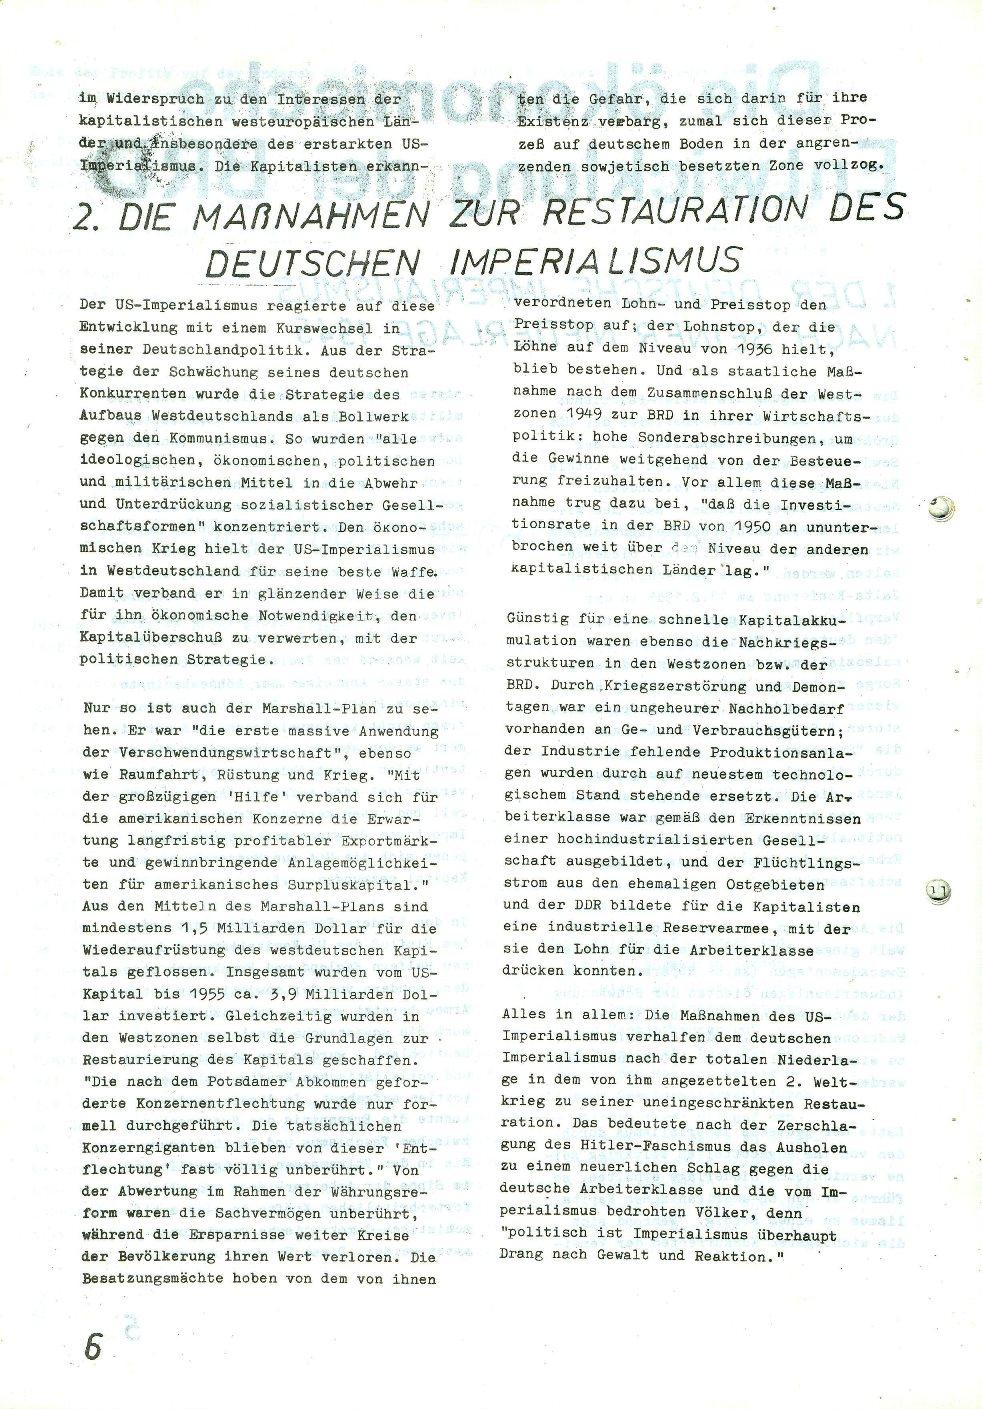 Oldenburg_KBW060